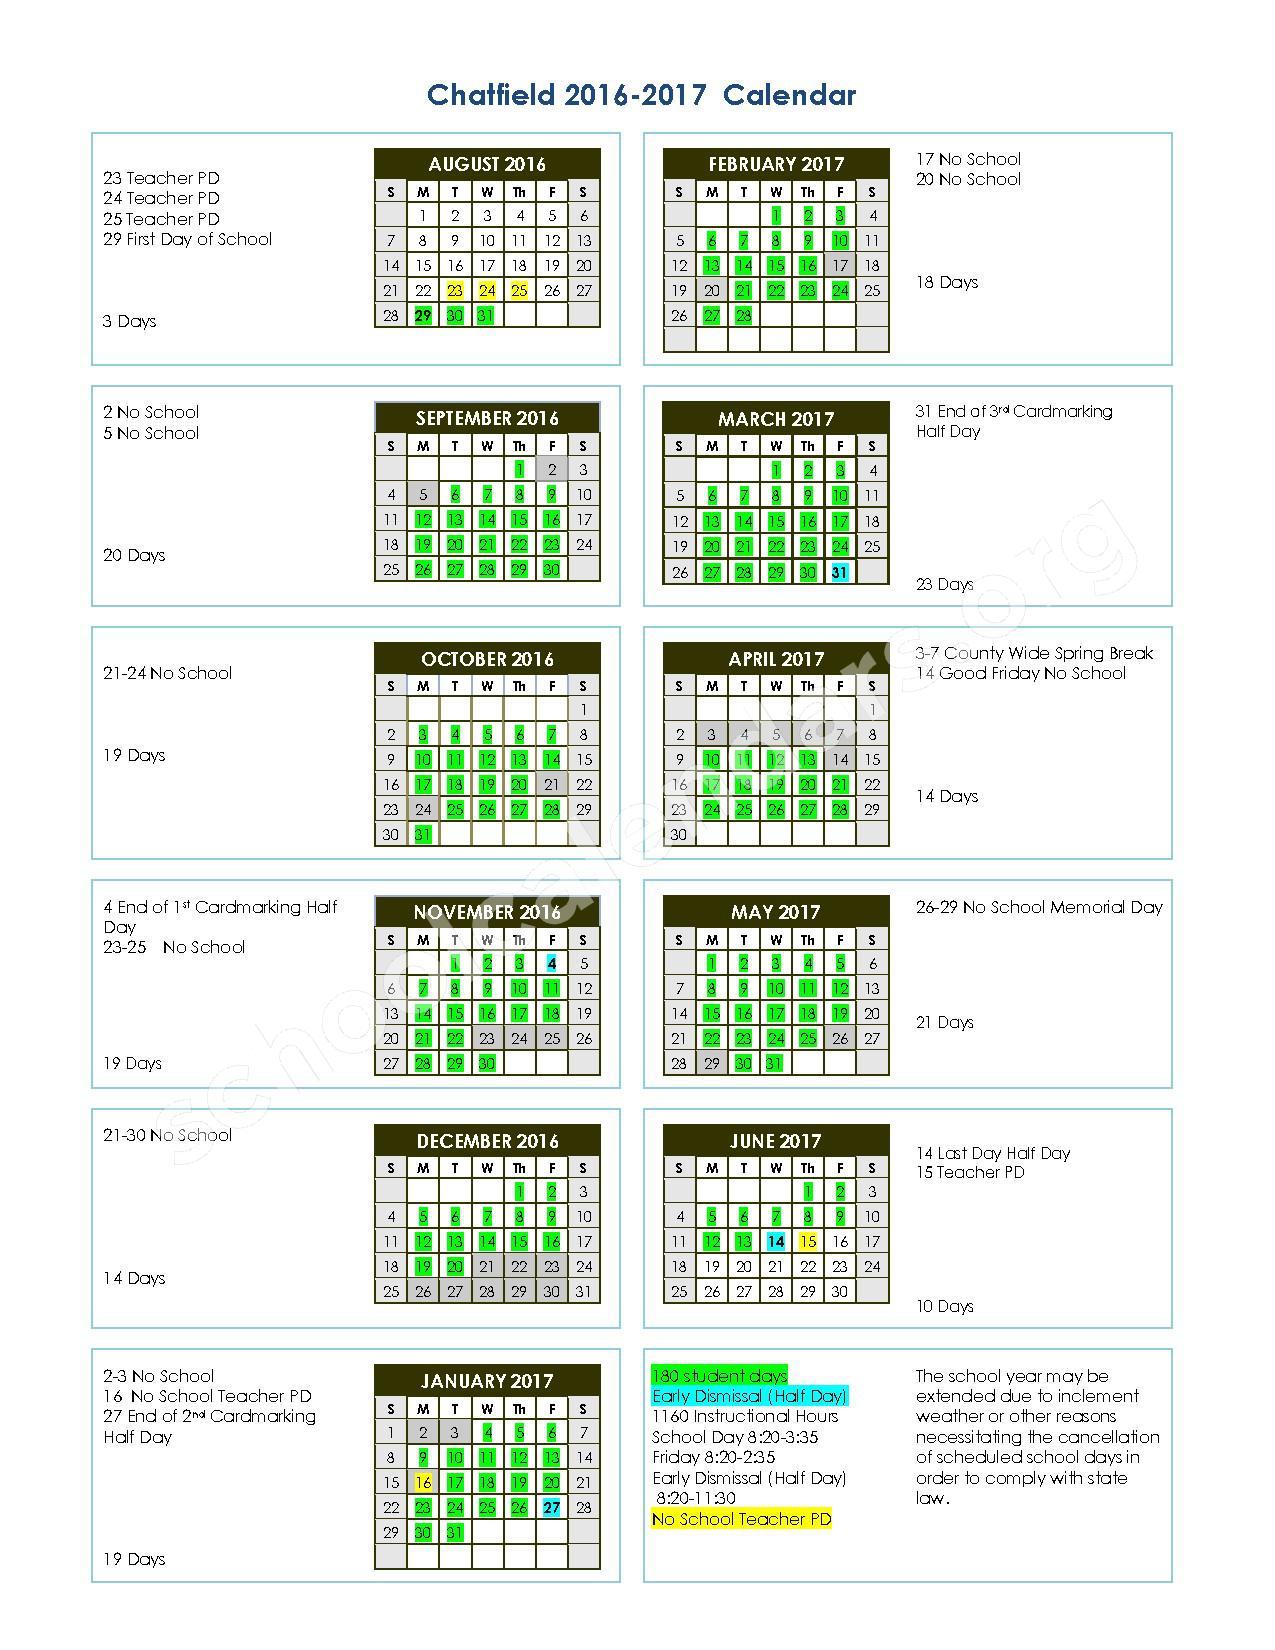 2016 - 2017 School Calendar – The Chatfield School – page 1